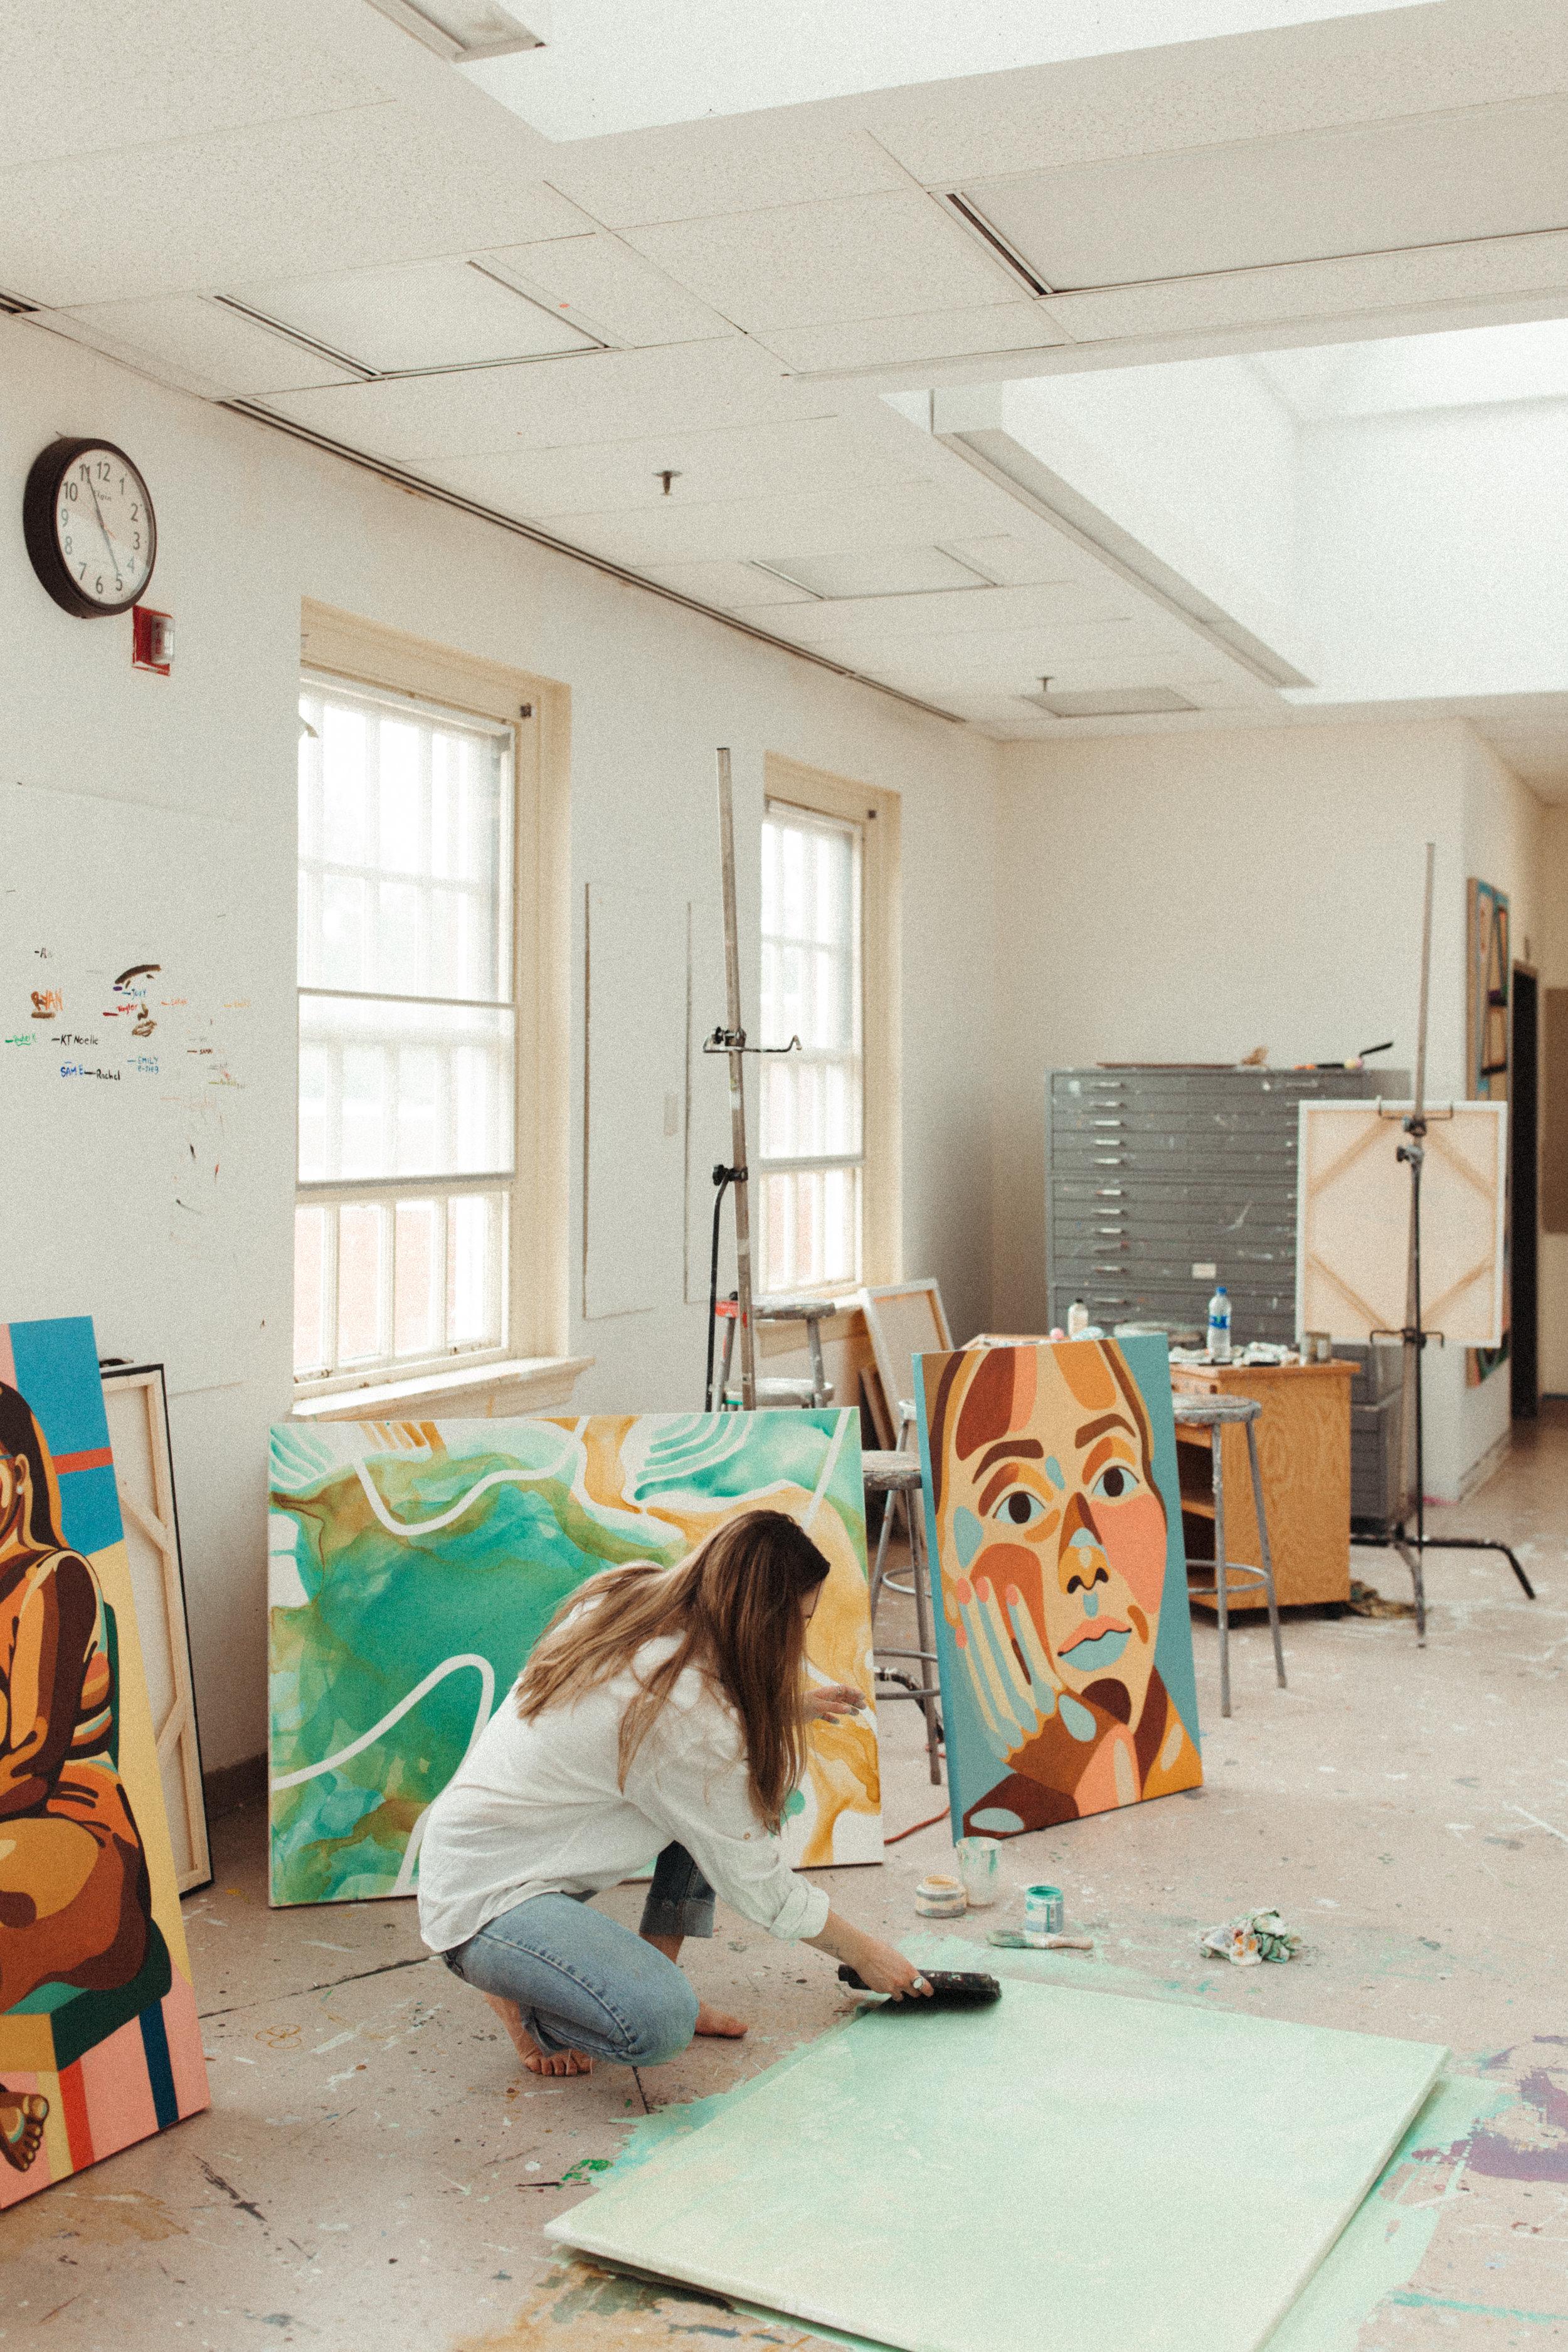 emily-pawlica-art-process-2019-peytoncurry-0572.jpg